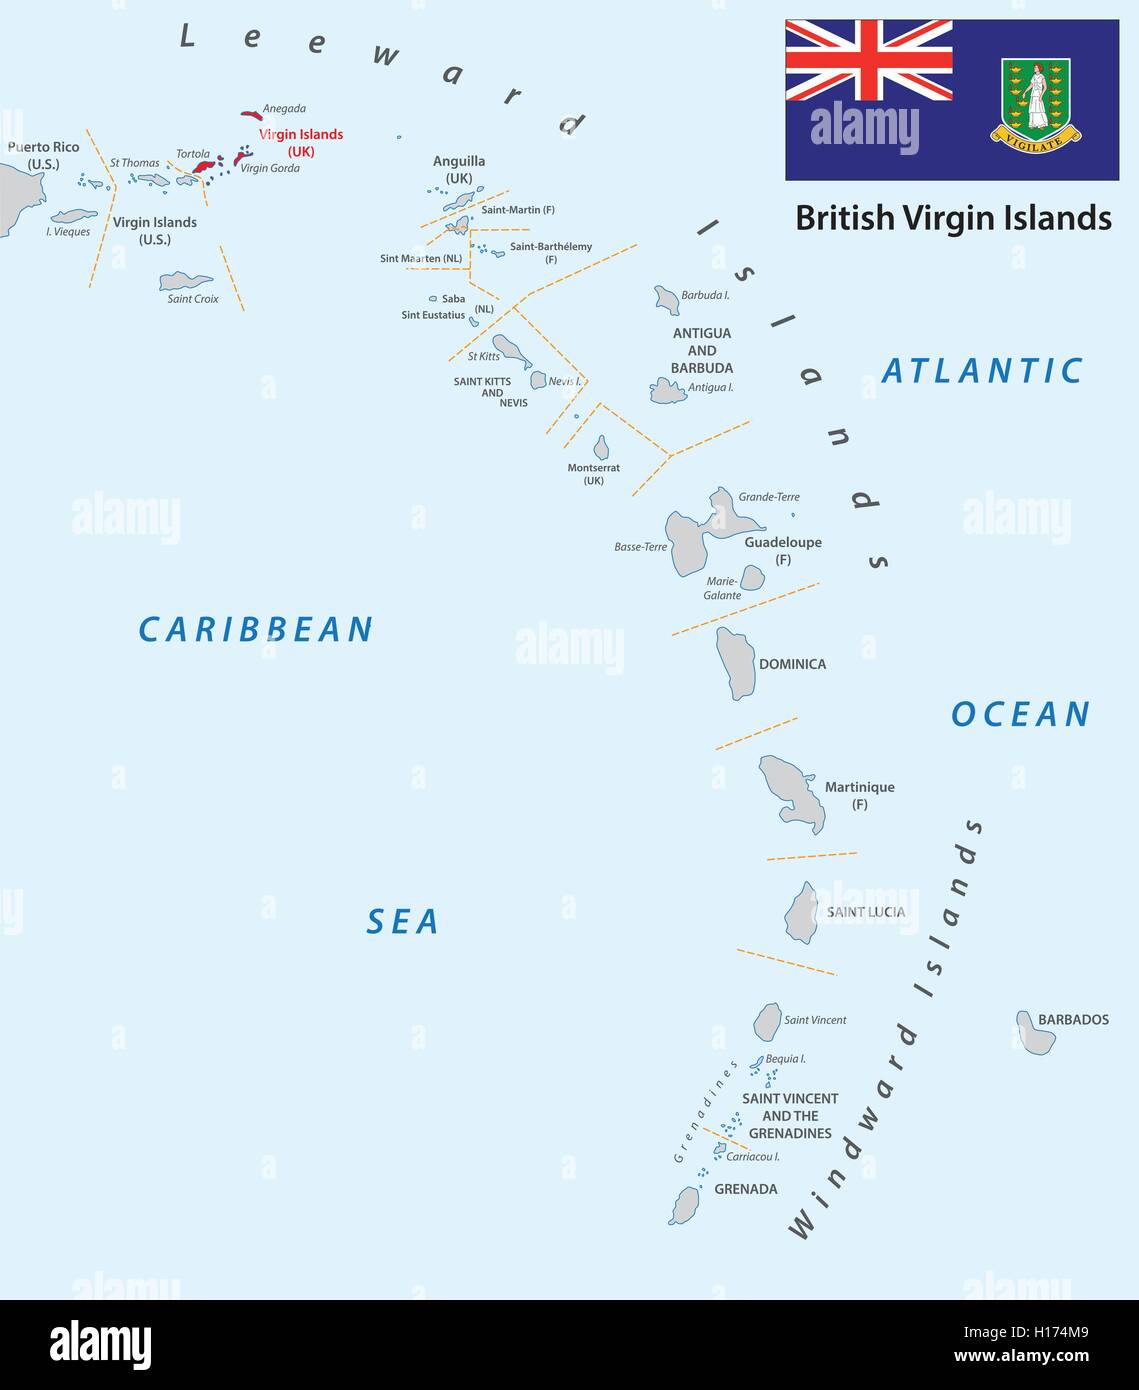 lesser antilles outline map with british virgin islands Stock Vector ...